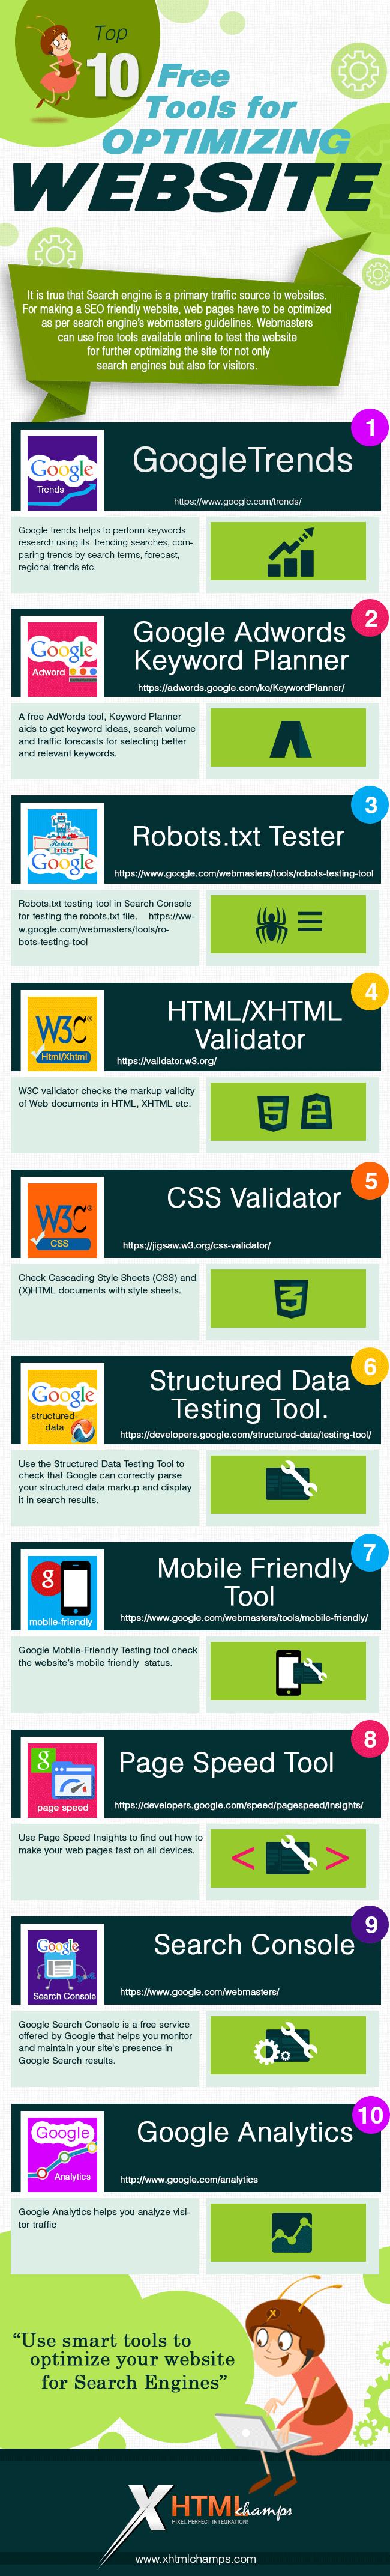 infographie-10-outils-seo-gratuits